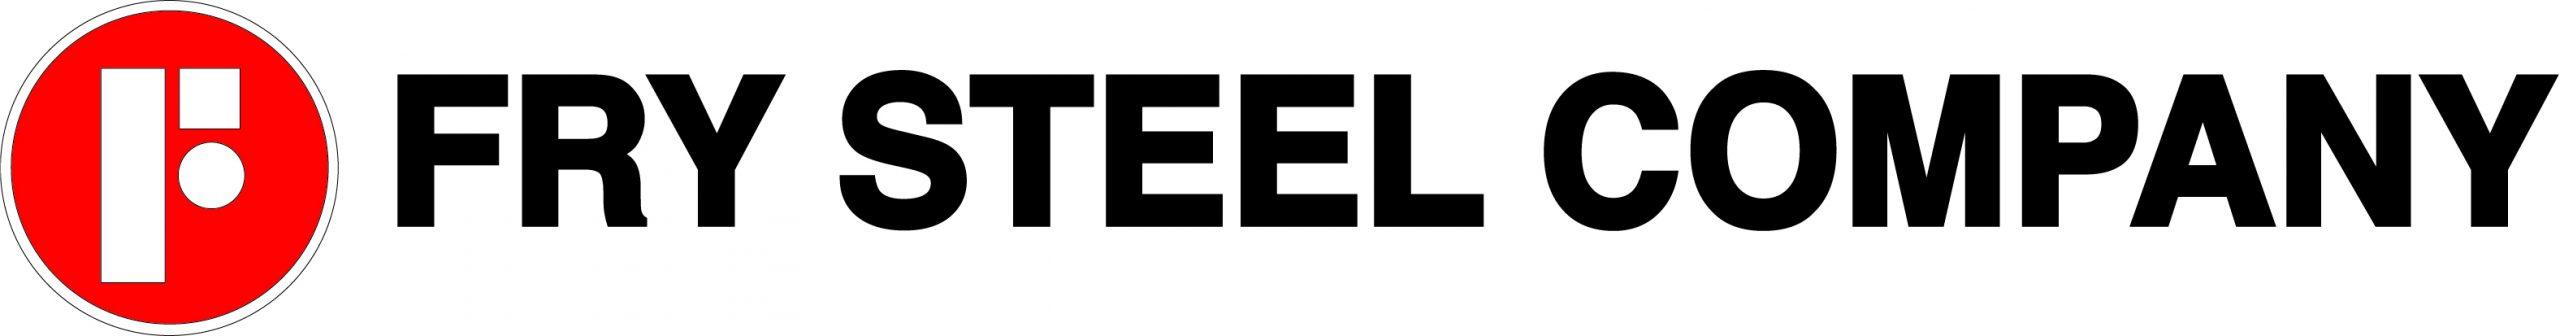 Fry Steel Company